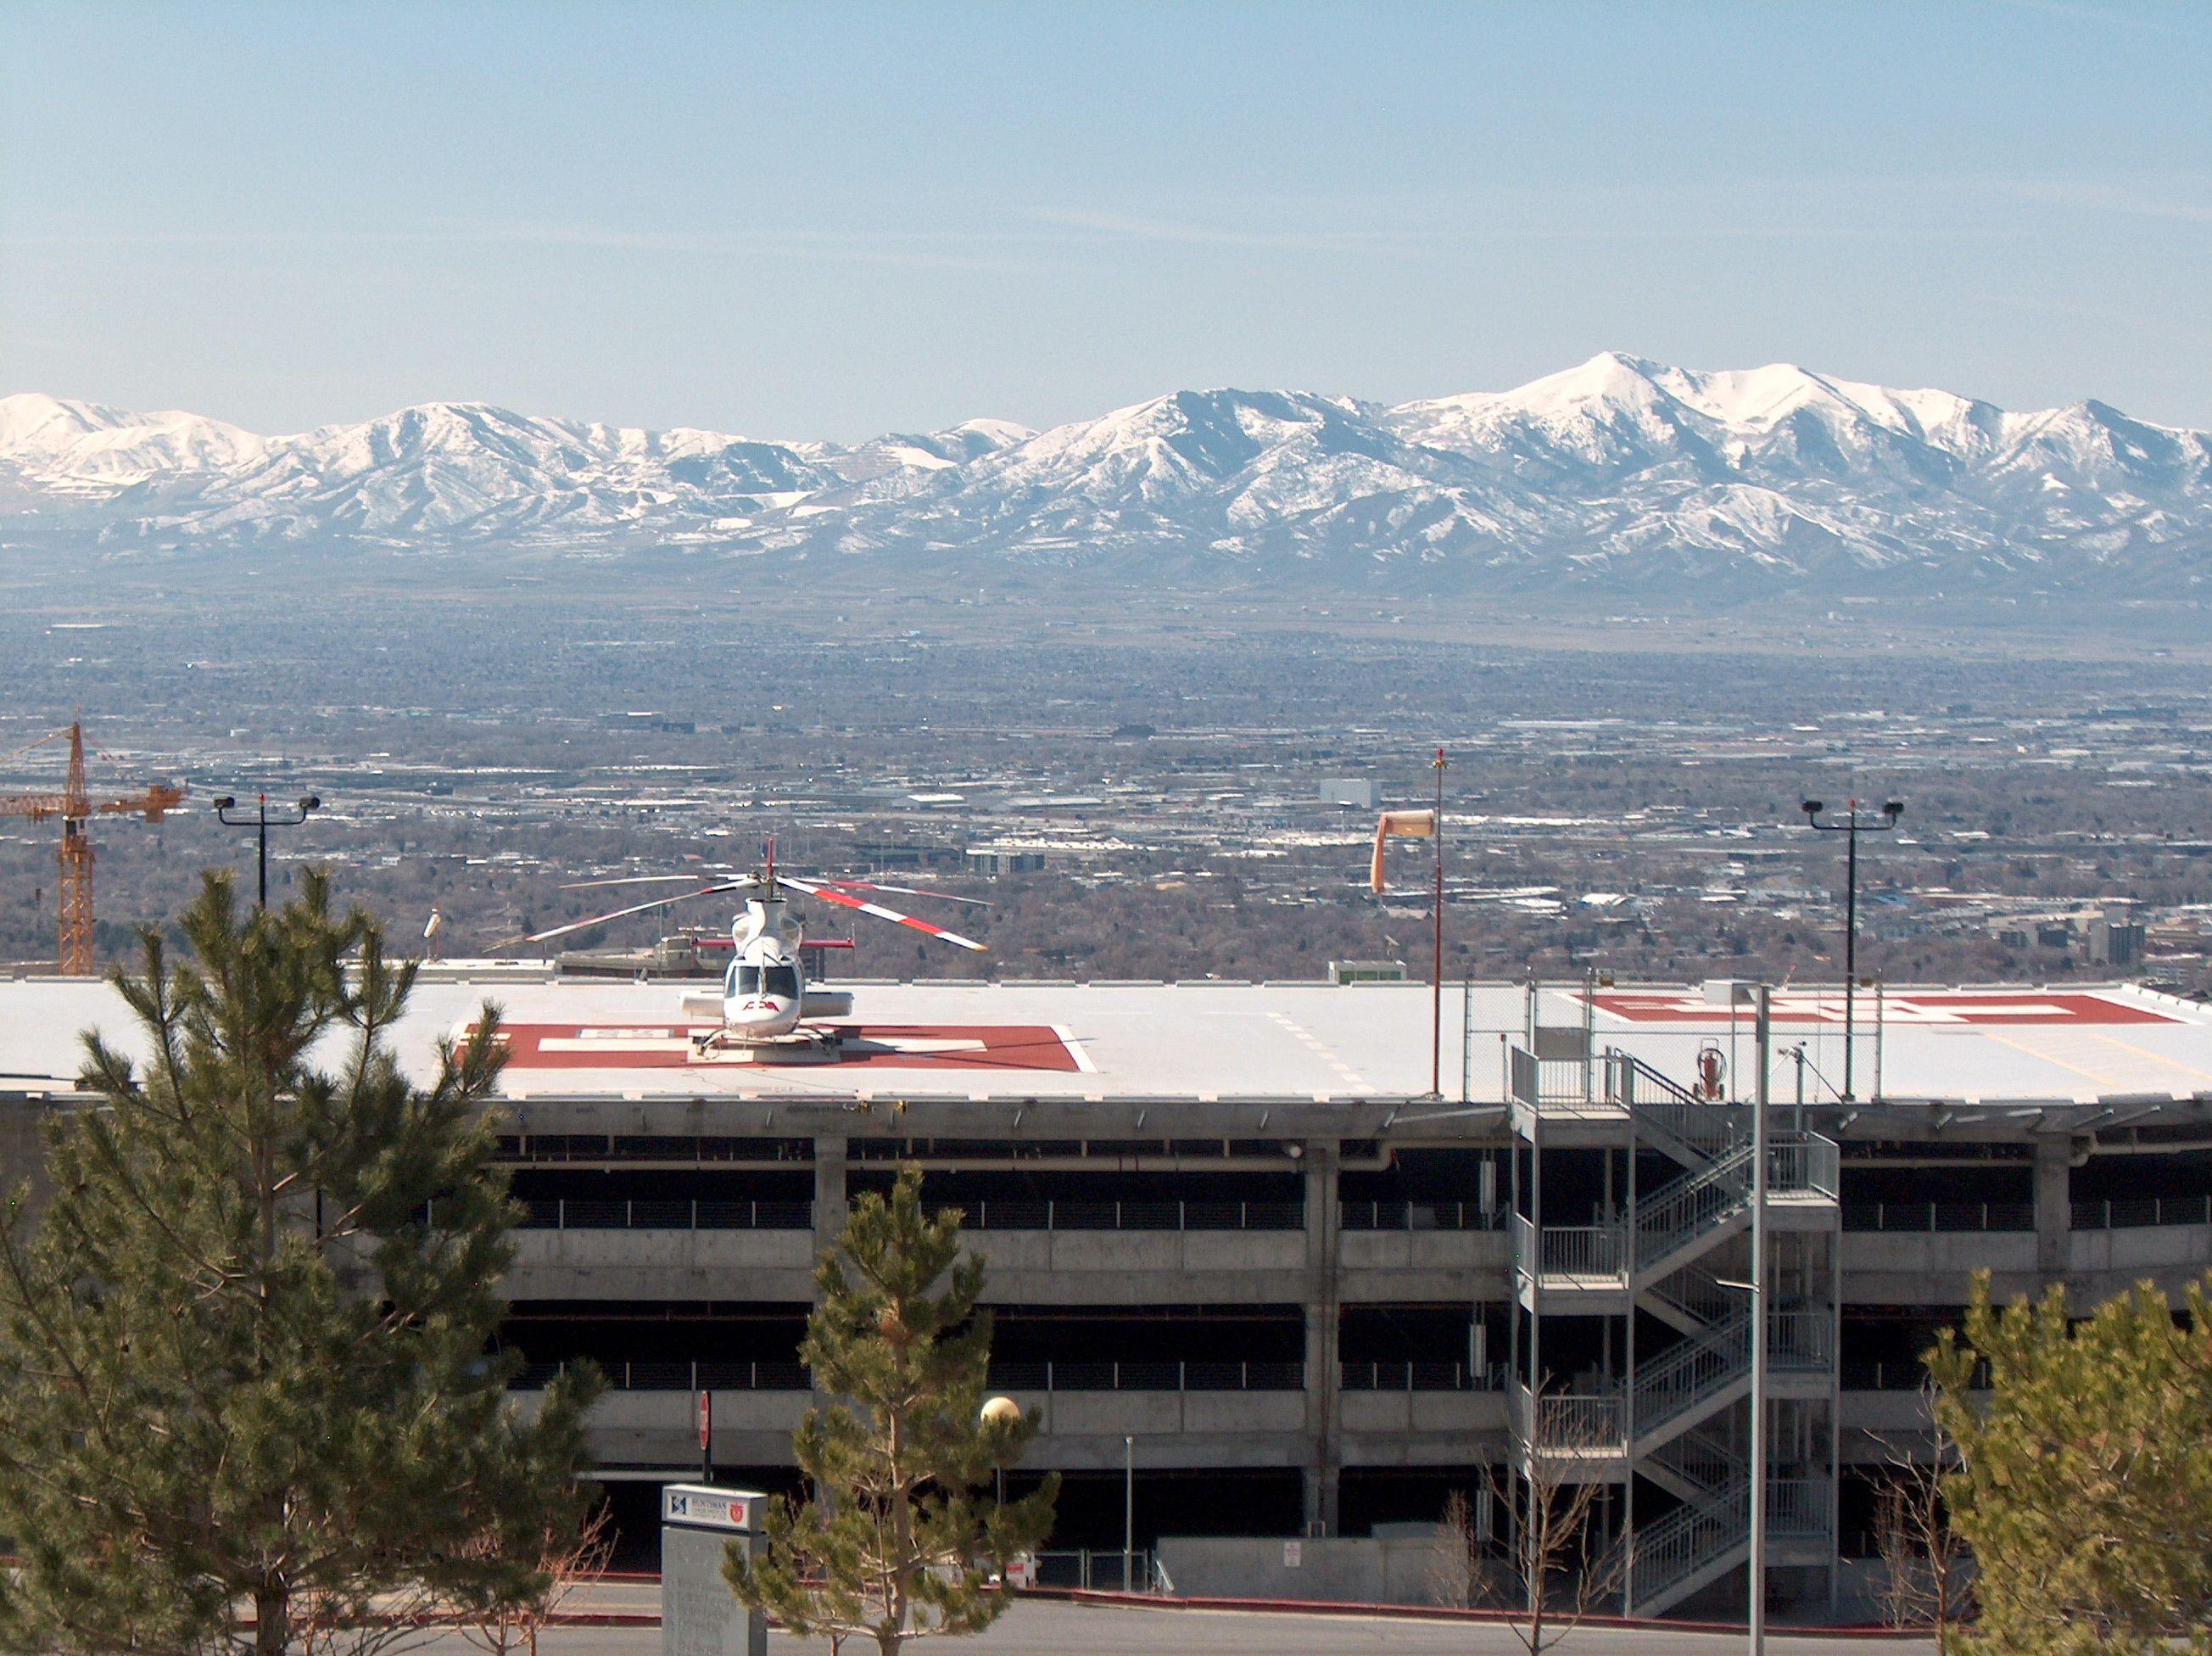 Since University Hospital in Salt Lake City, Utah opened